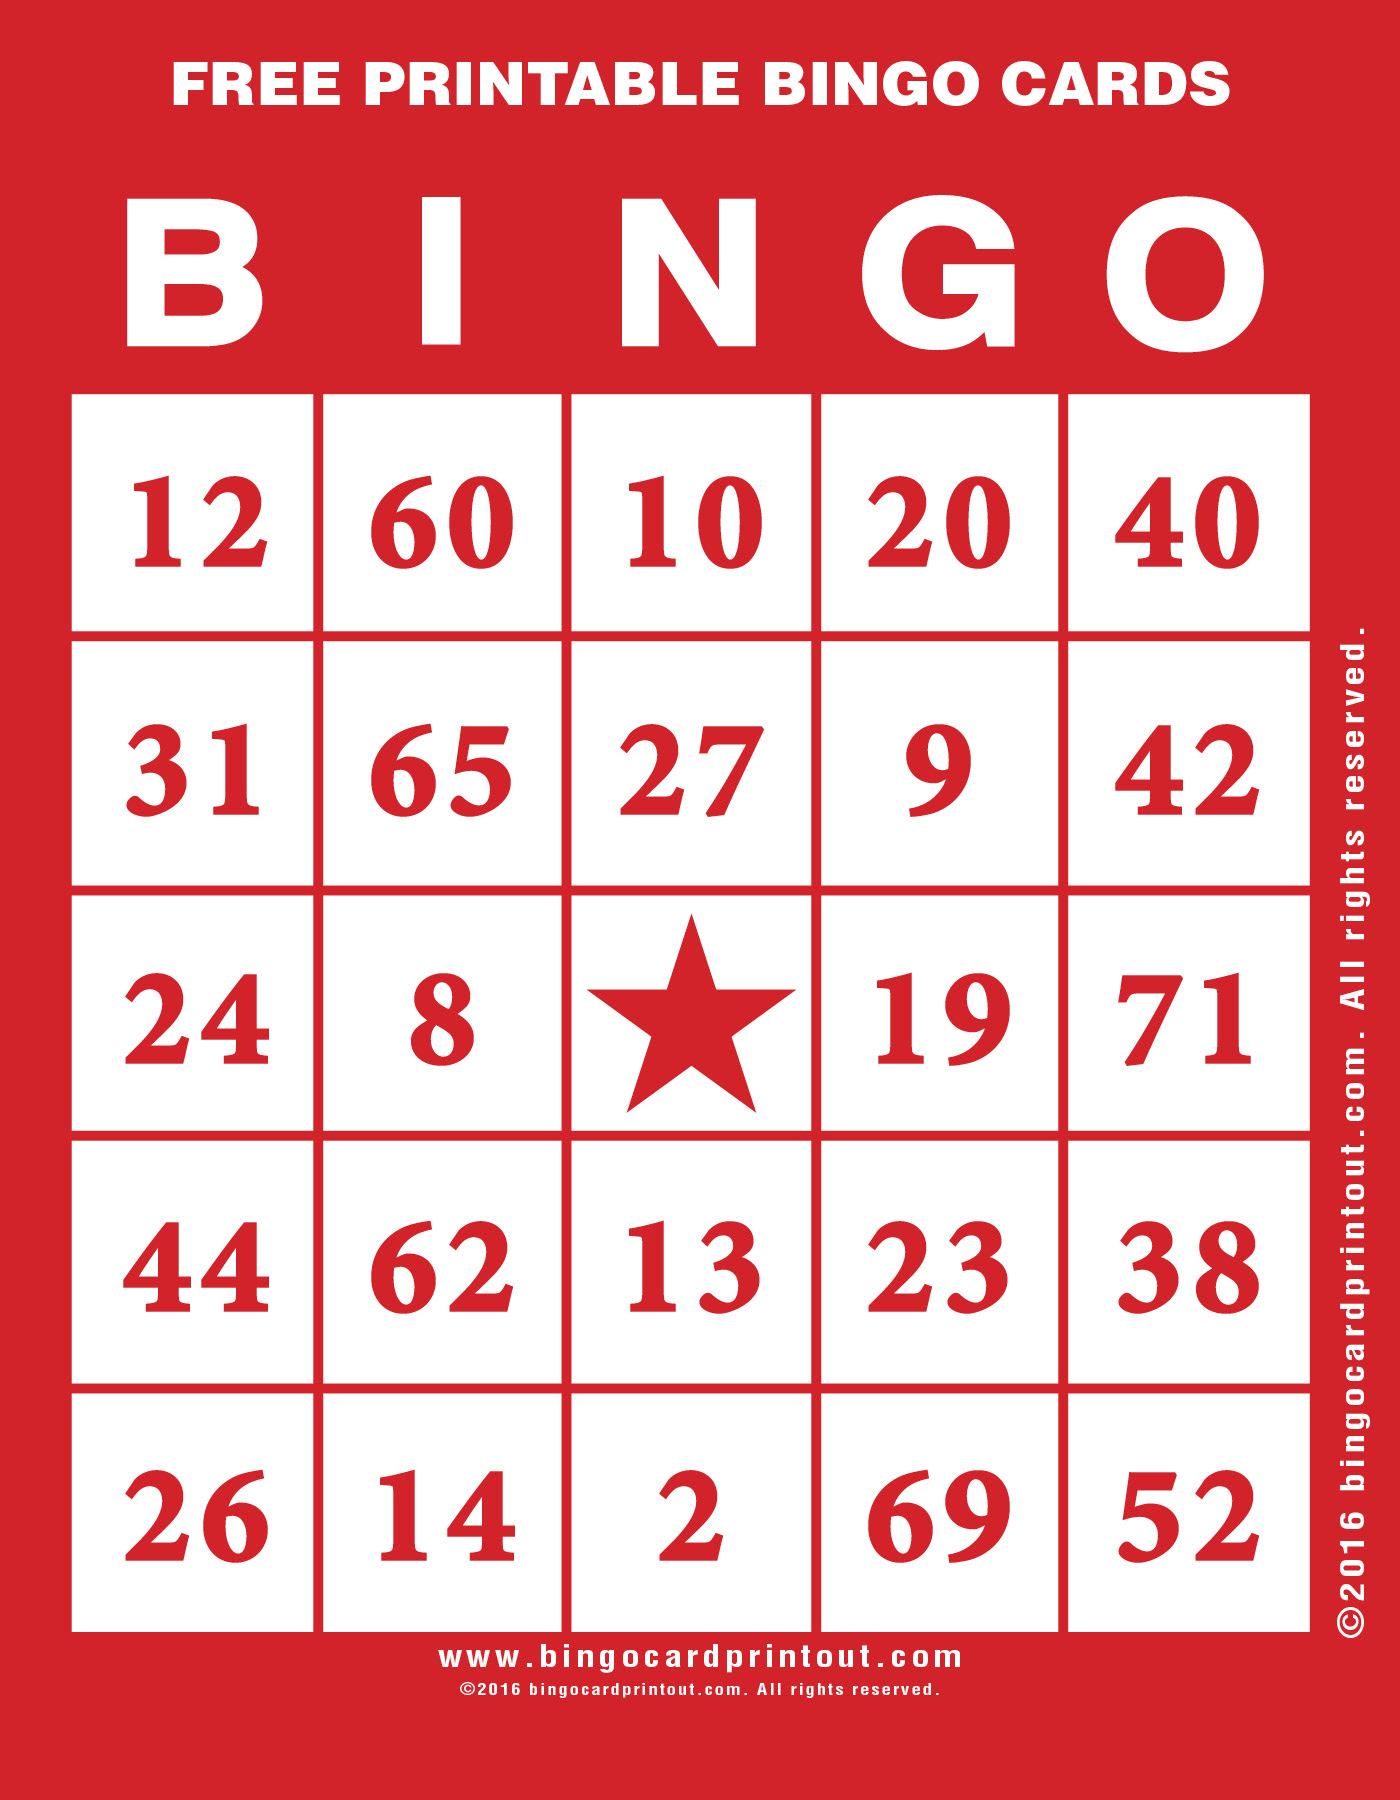 Bingo cards picture